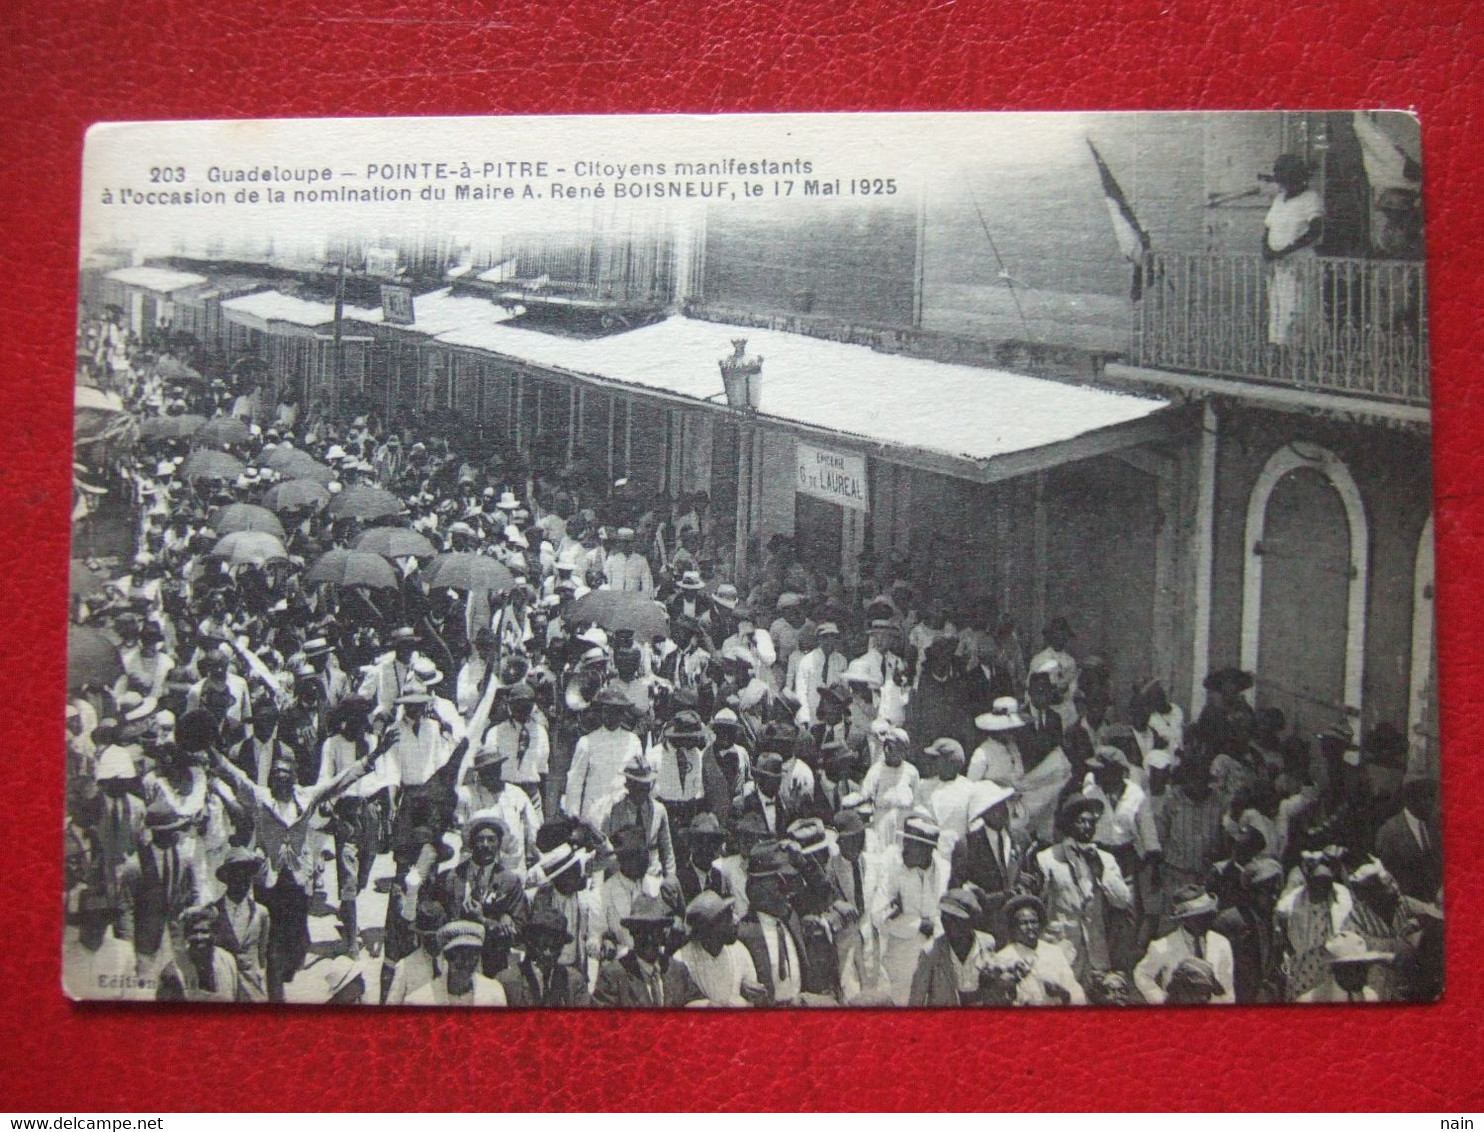 "GUADELOUPE - POINTRE A PITRE - "" CITOYENS MANIFESTANTS ..NOMINATION MAIRE RENE BOISNEUF LE 17 MAI 1925 "" - "" TRES RARE "" - Unclassified"